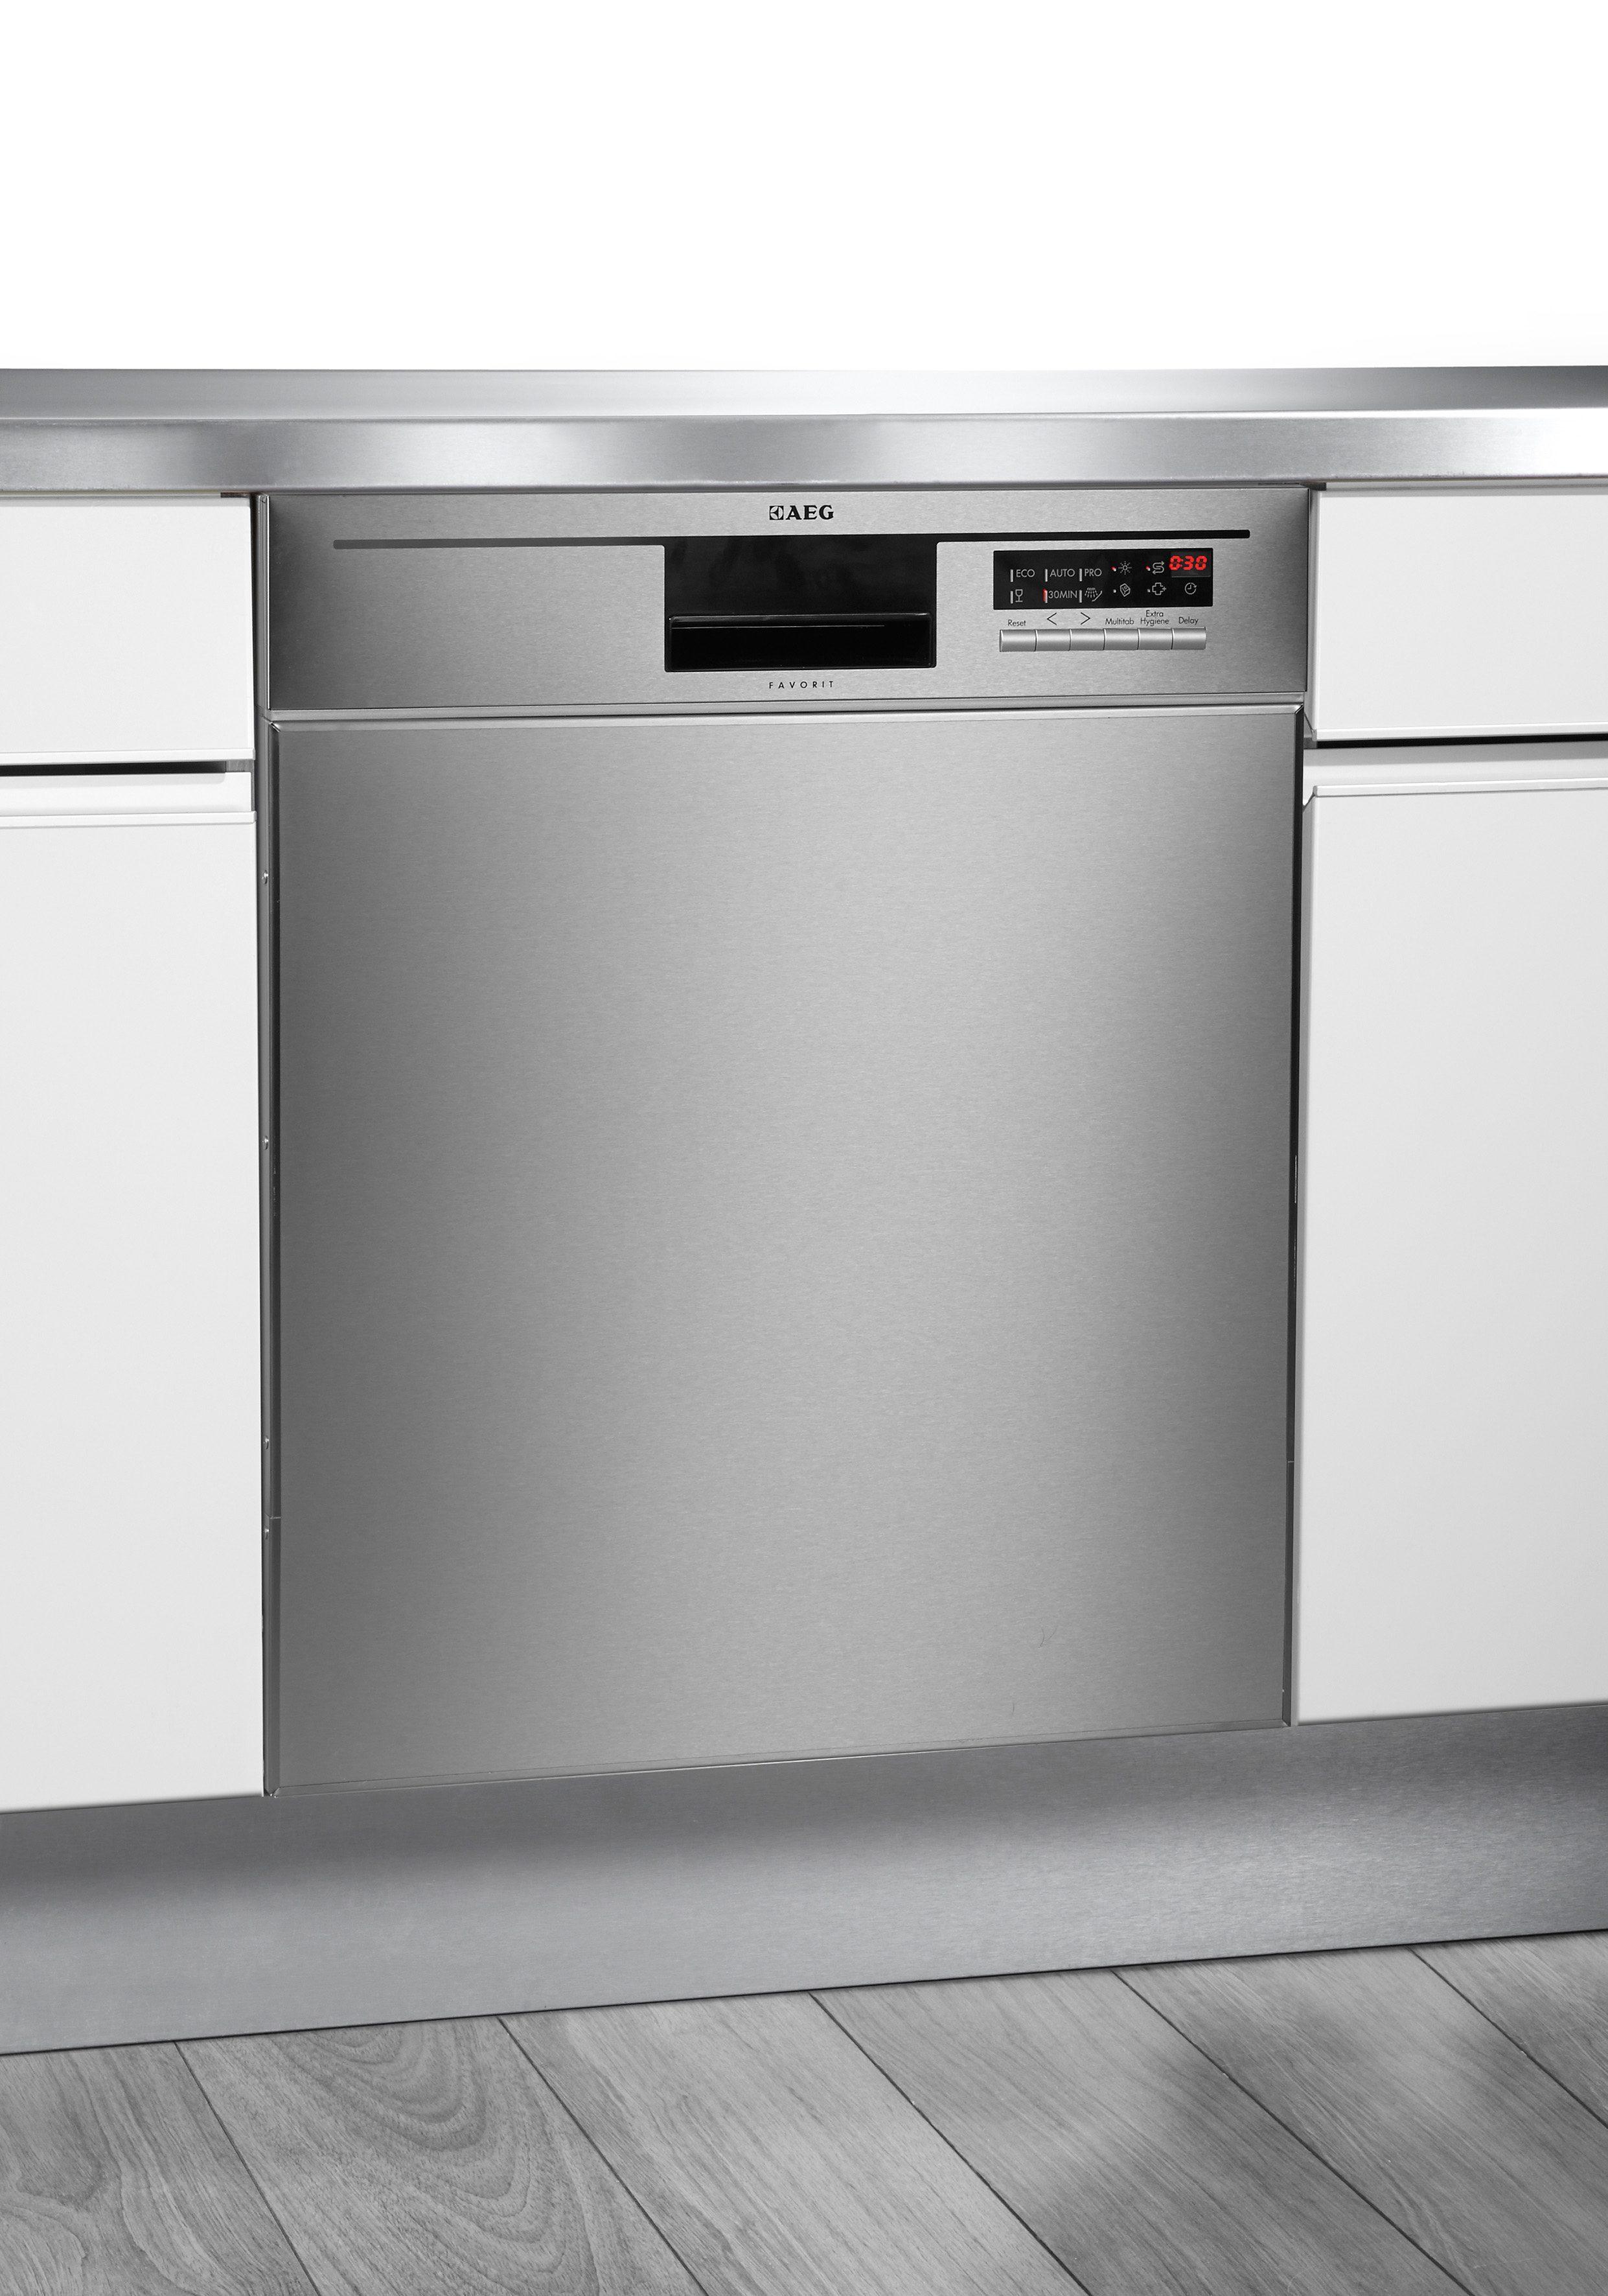 AEG Unterbau Geschirrspüler FAVORIT F56602UD0P,FUMOP, UWOP A++, 10,2 Liter, 13 Maßgedecke